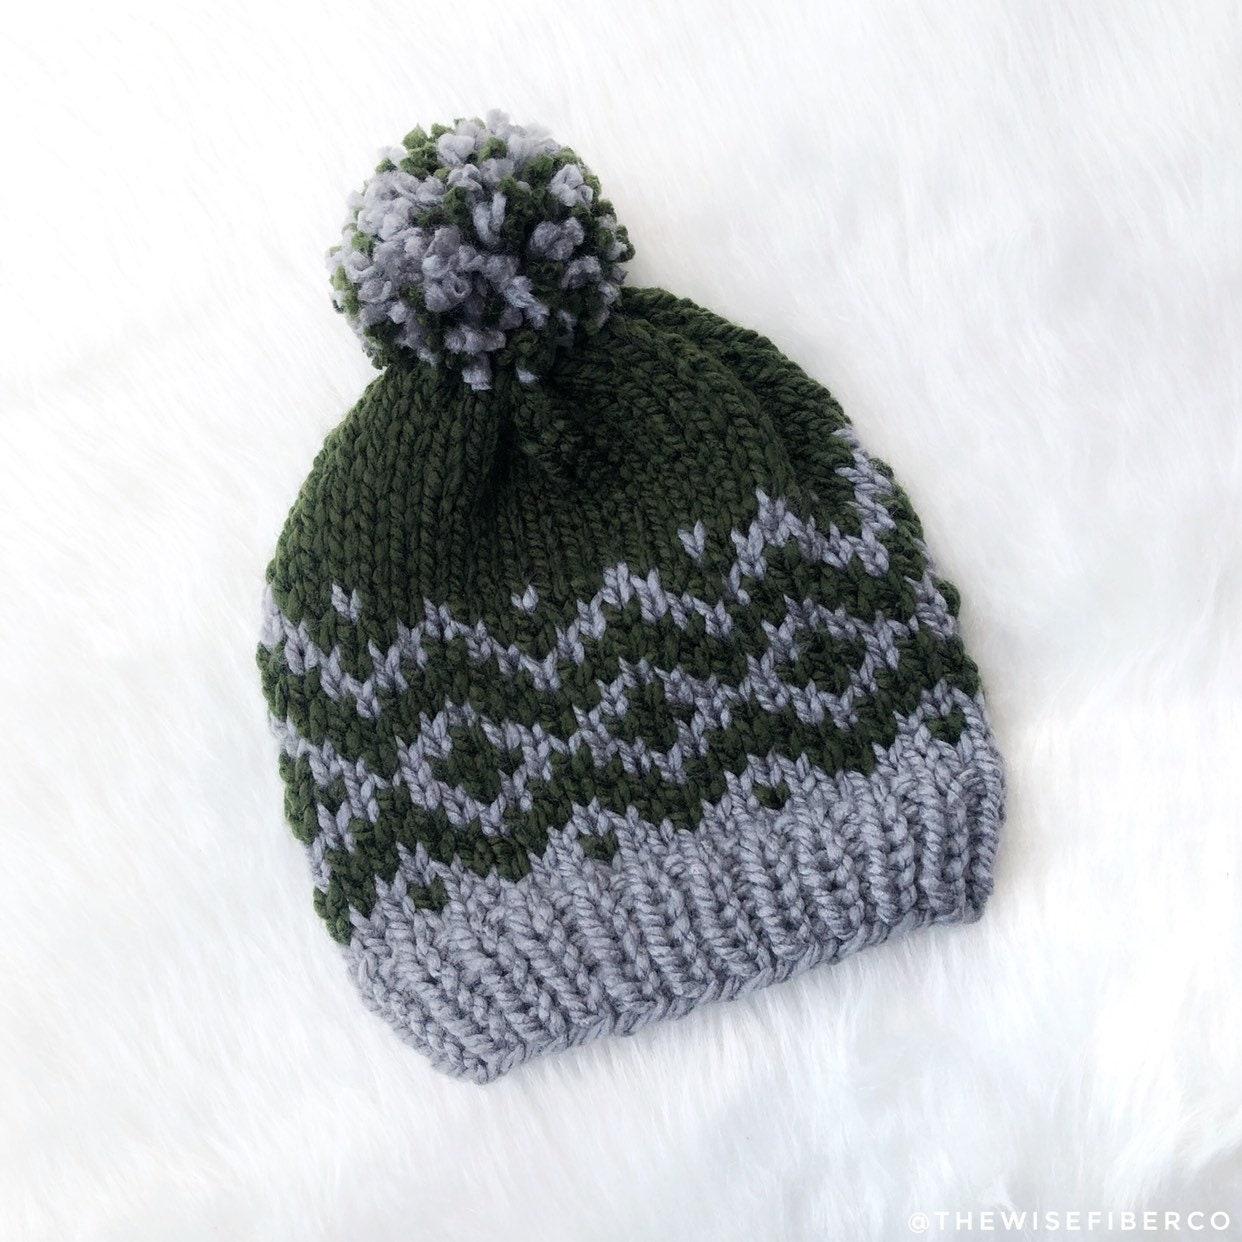 5e49b23ef8e7de Women's Olive Green & Gray Nordic Chunky Knit Beanie w/ | Etsy